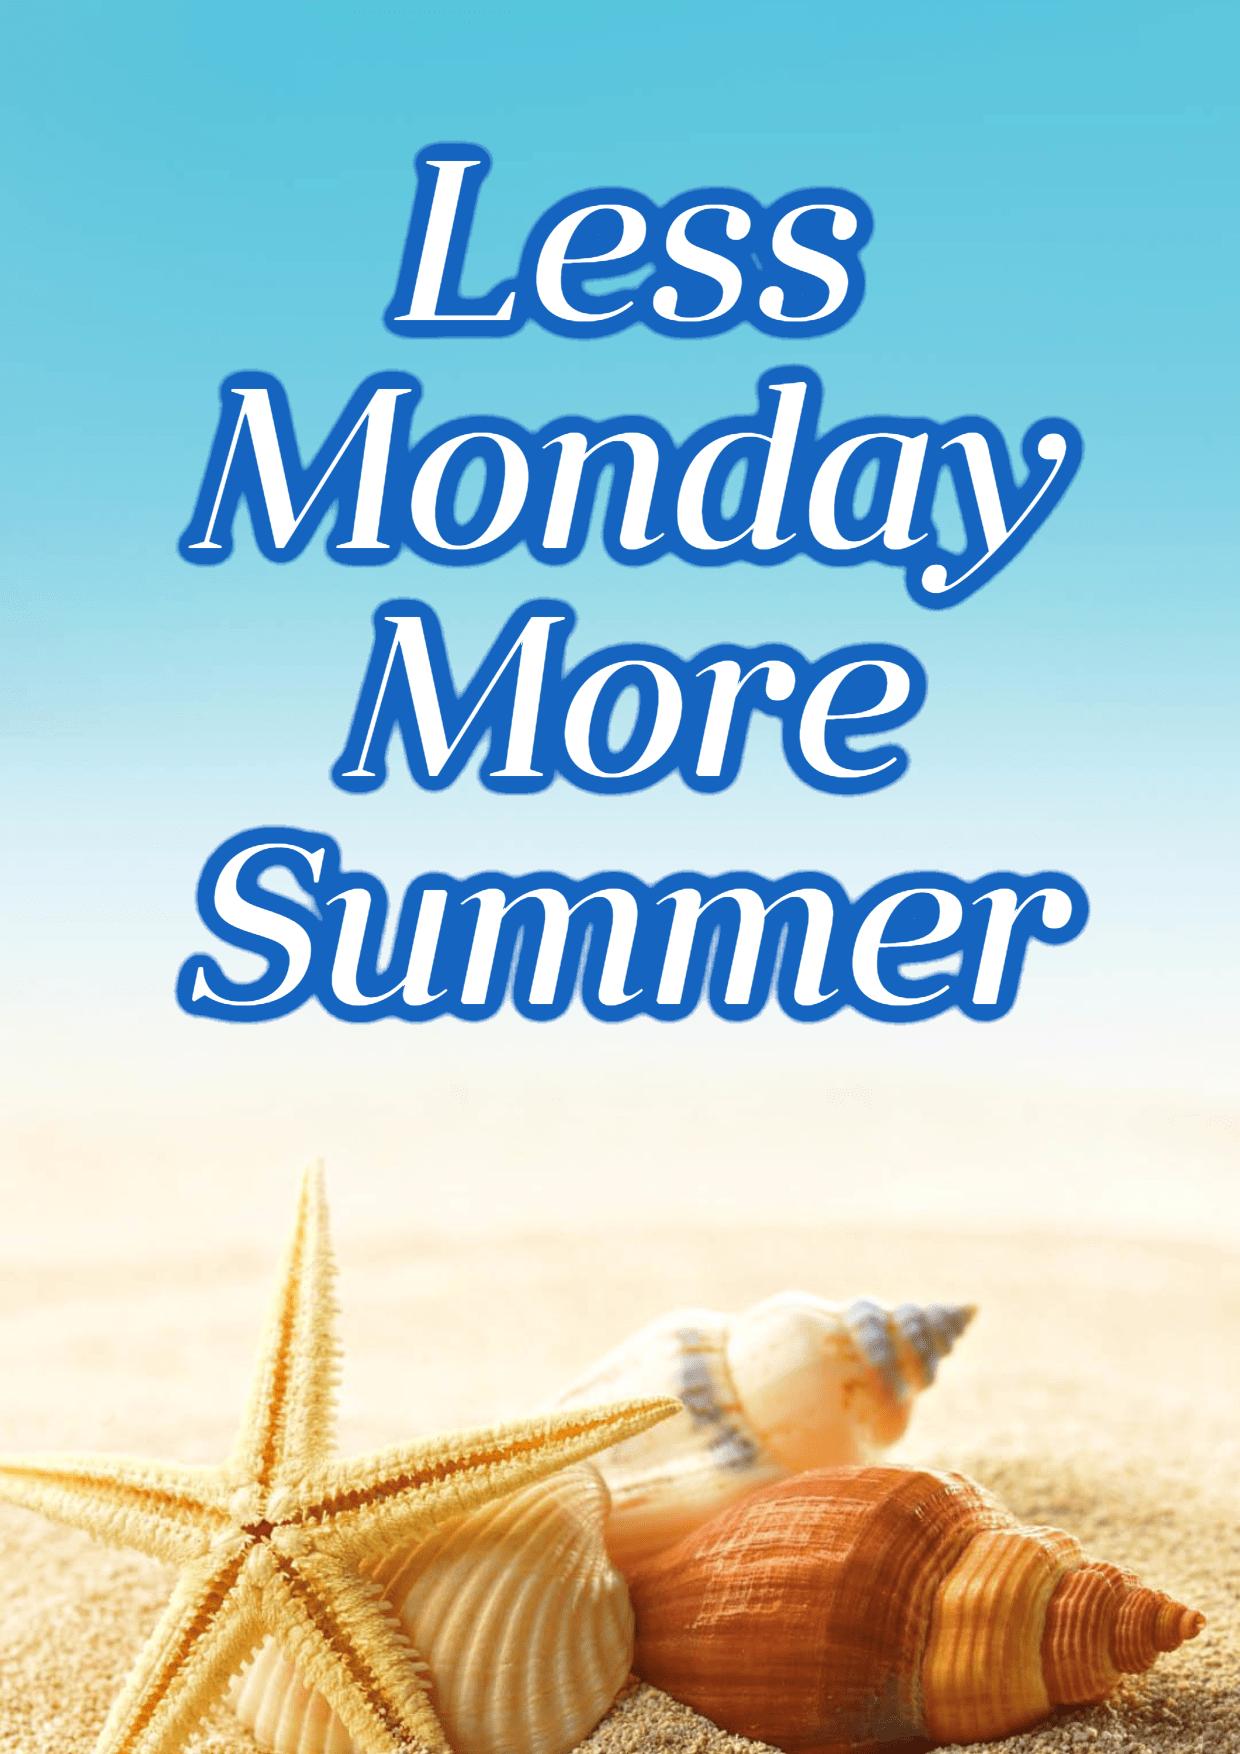 Grass,                Family,                Summer,                Ocean,                Beach,                Fun,                Vacation,                Vibes,                Waves,                Sea,                White,                Aqua,                 Free Image